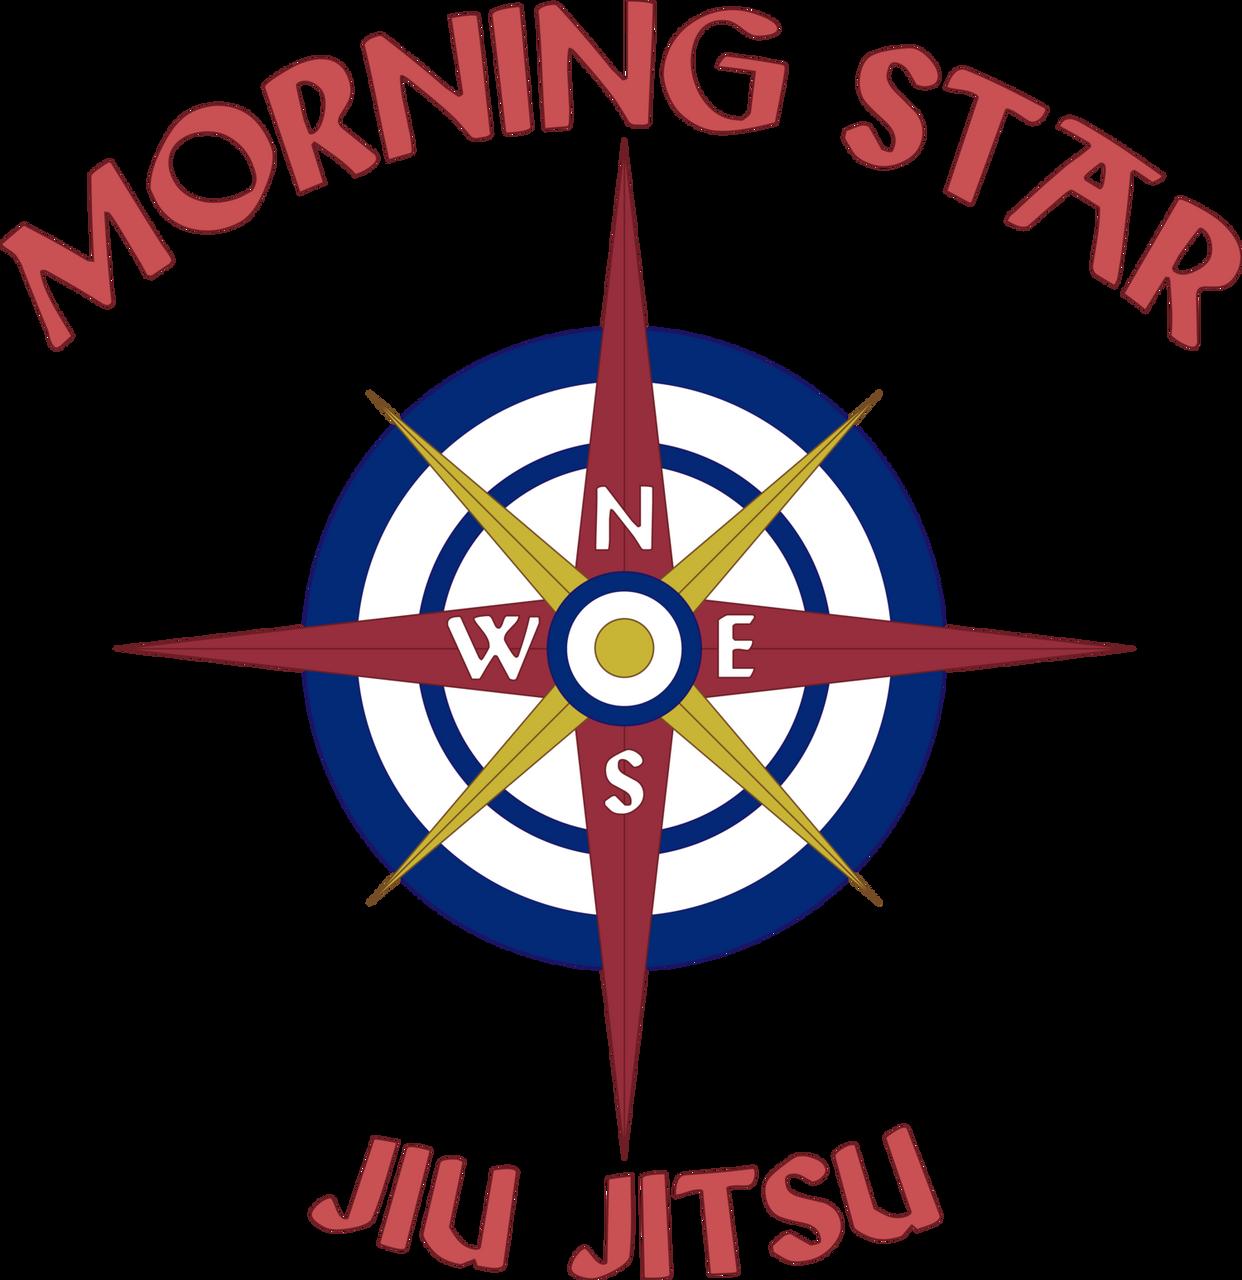 Morning Star Jiu-Jitsu